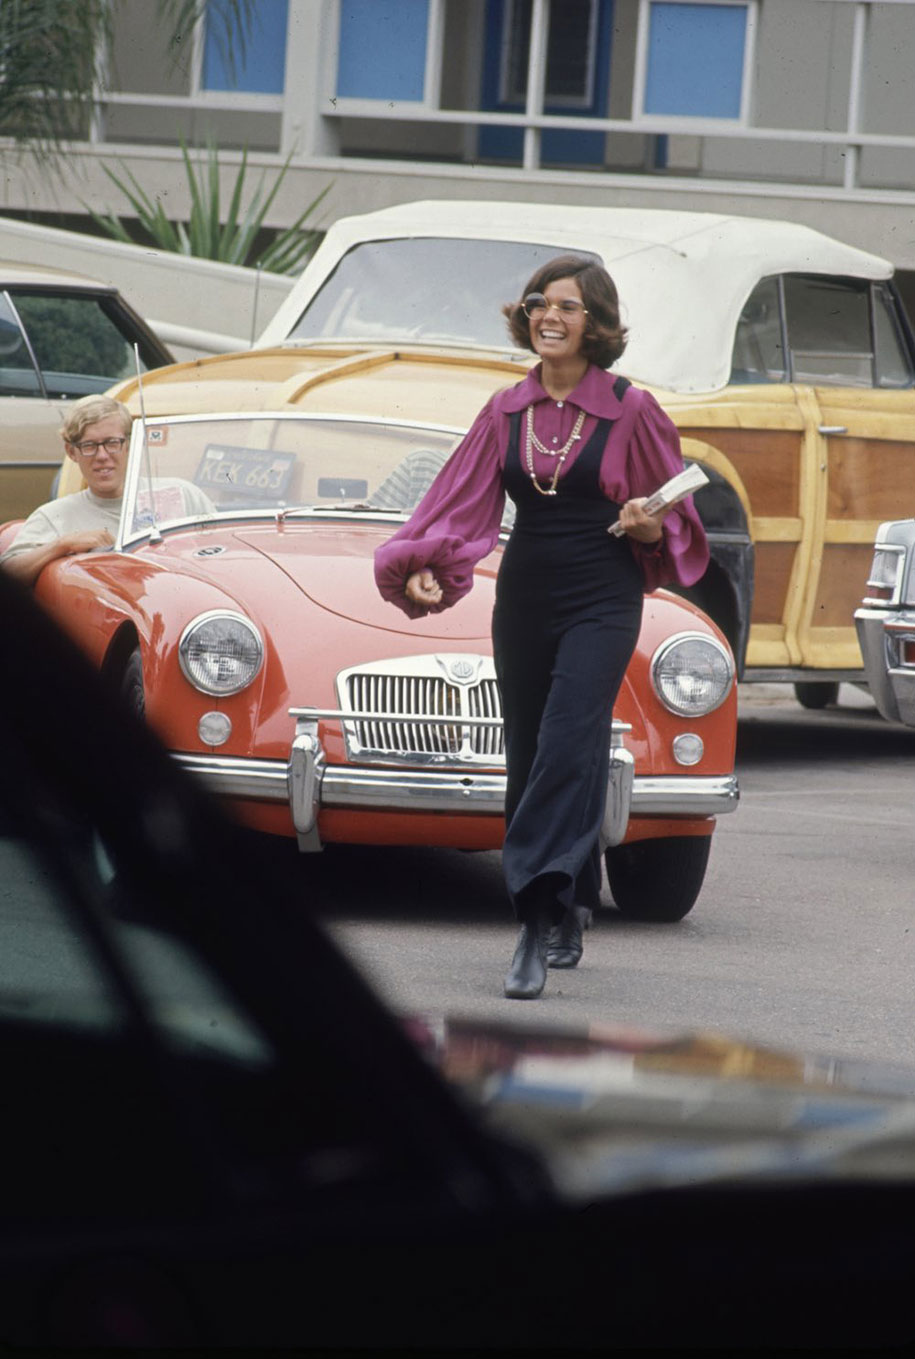 1969-hippie-high-school-counterculture-photography-8